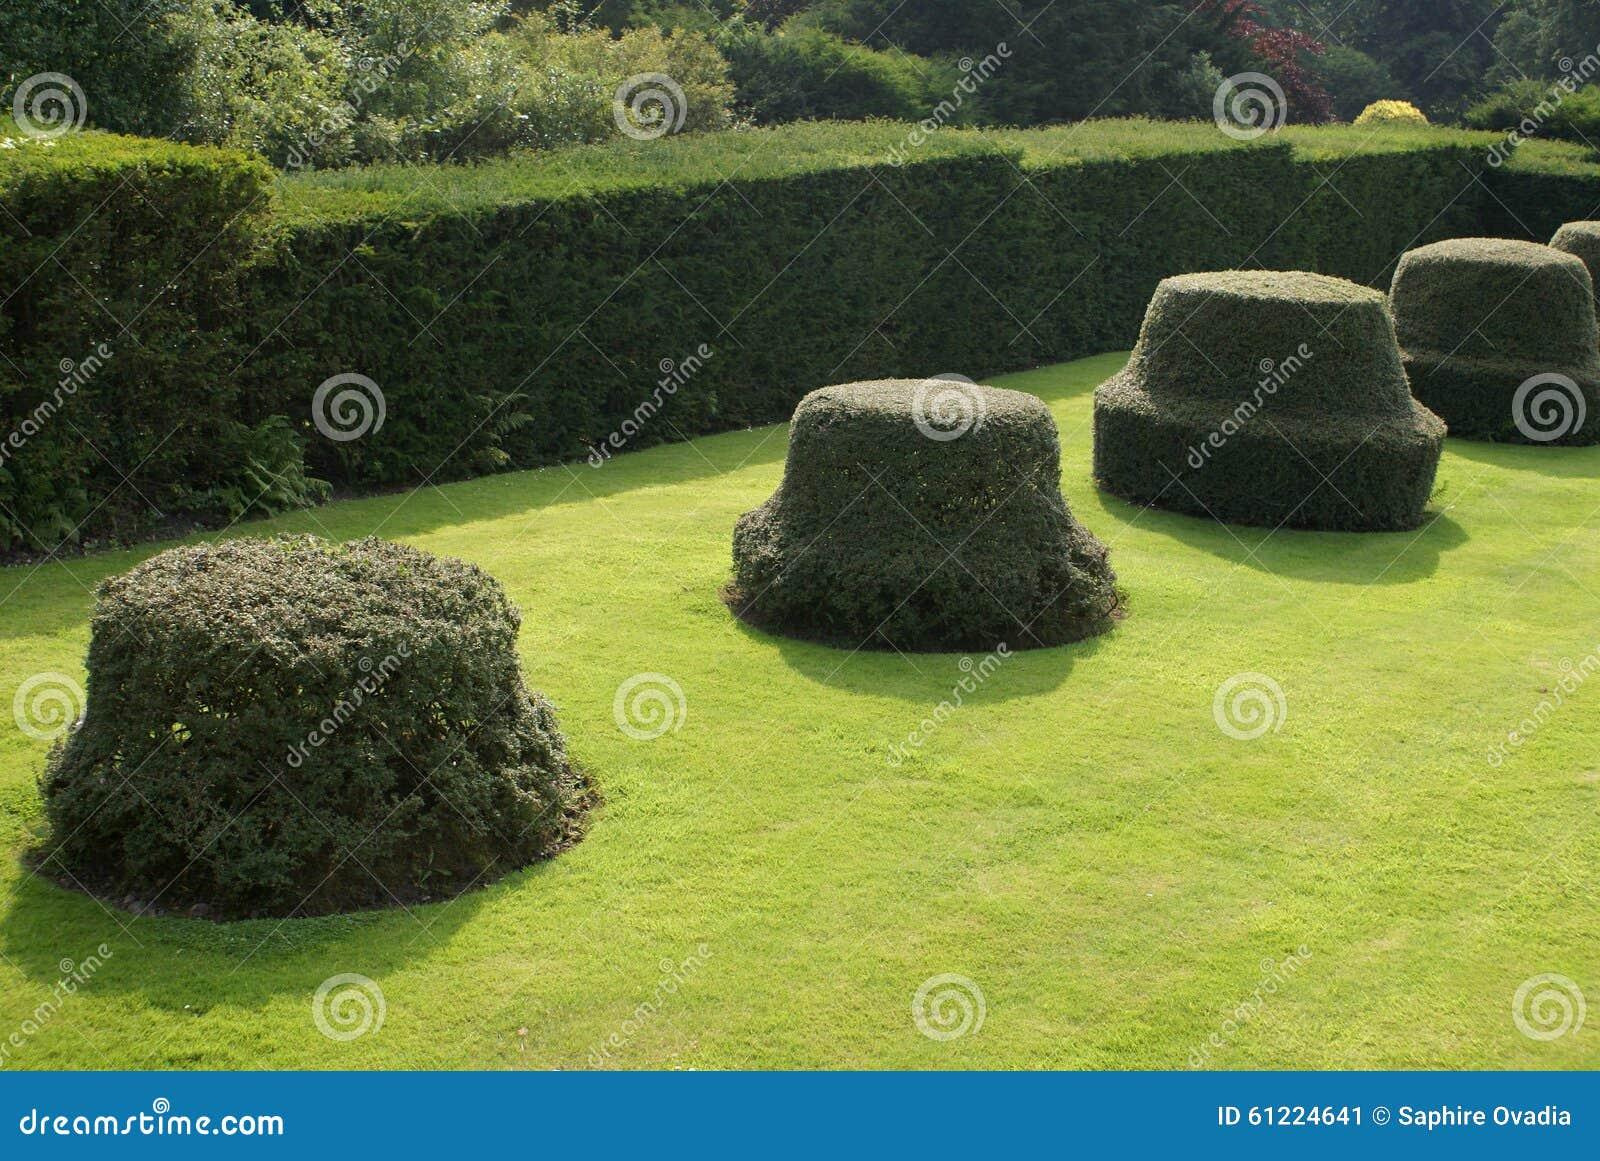 Garden Art. Garden Design. Topiary Trees Stock Image - Image of ...